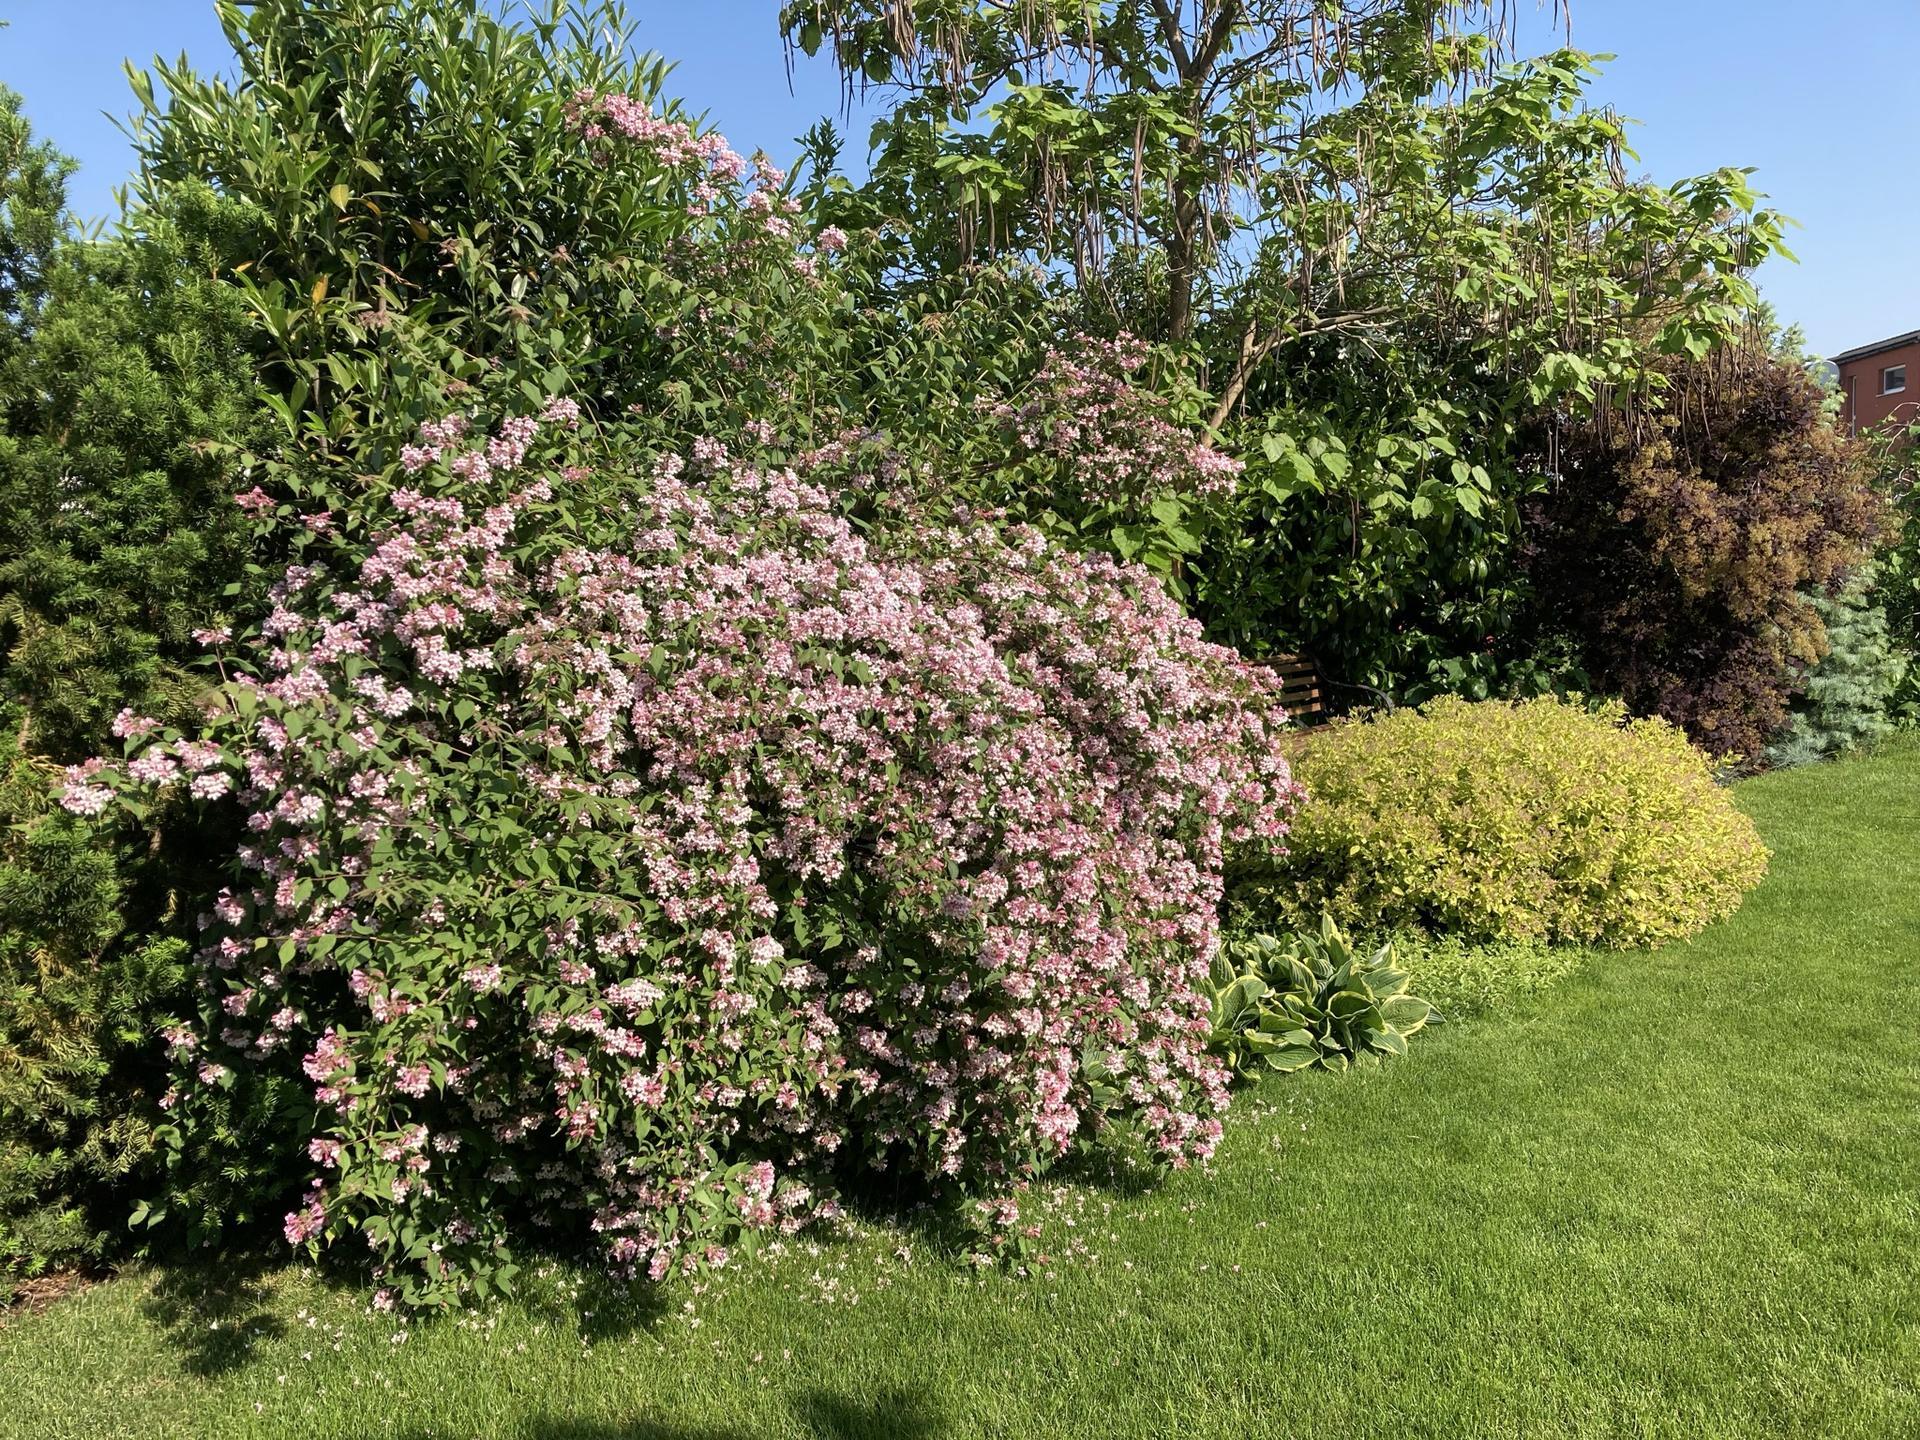 Zahrada 2021 - Kolkwitzie krasna v plnem kvetu